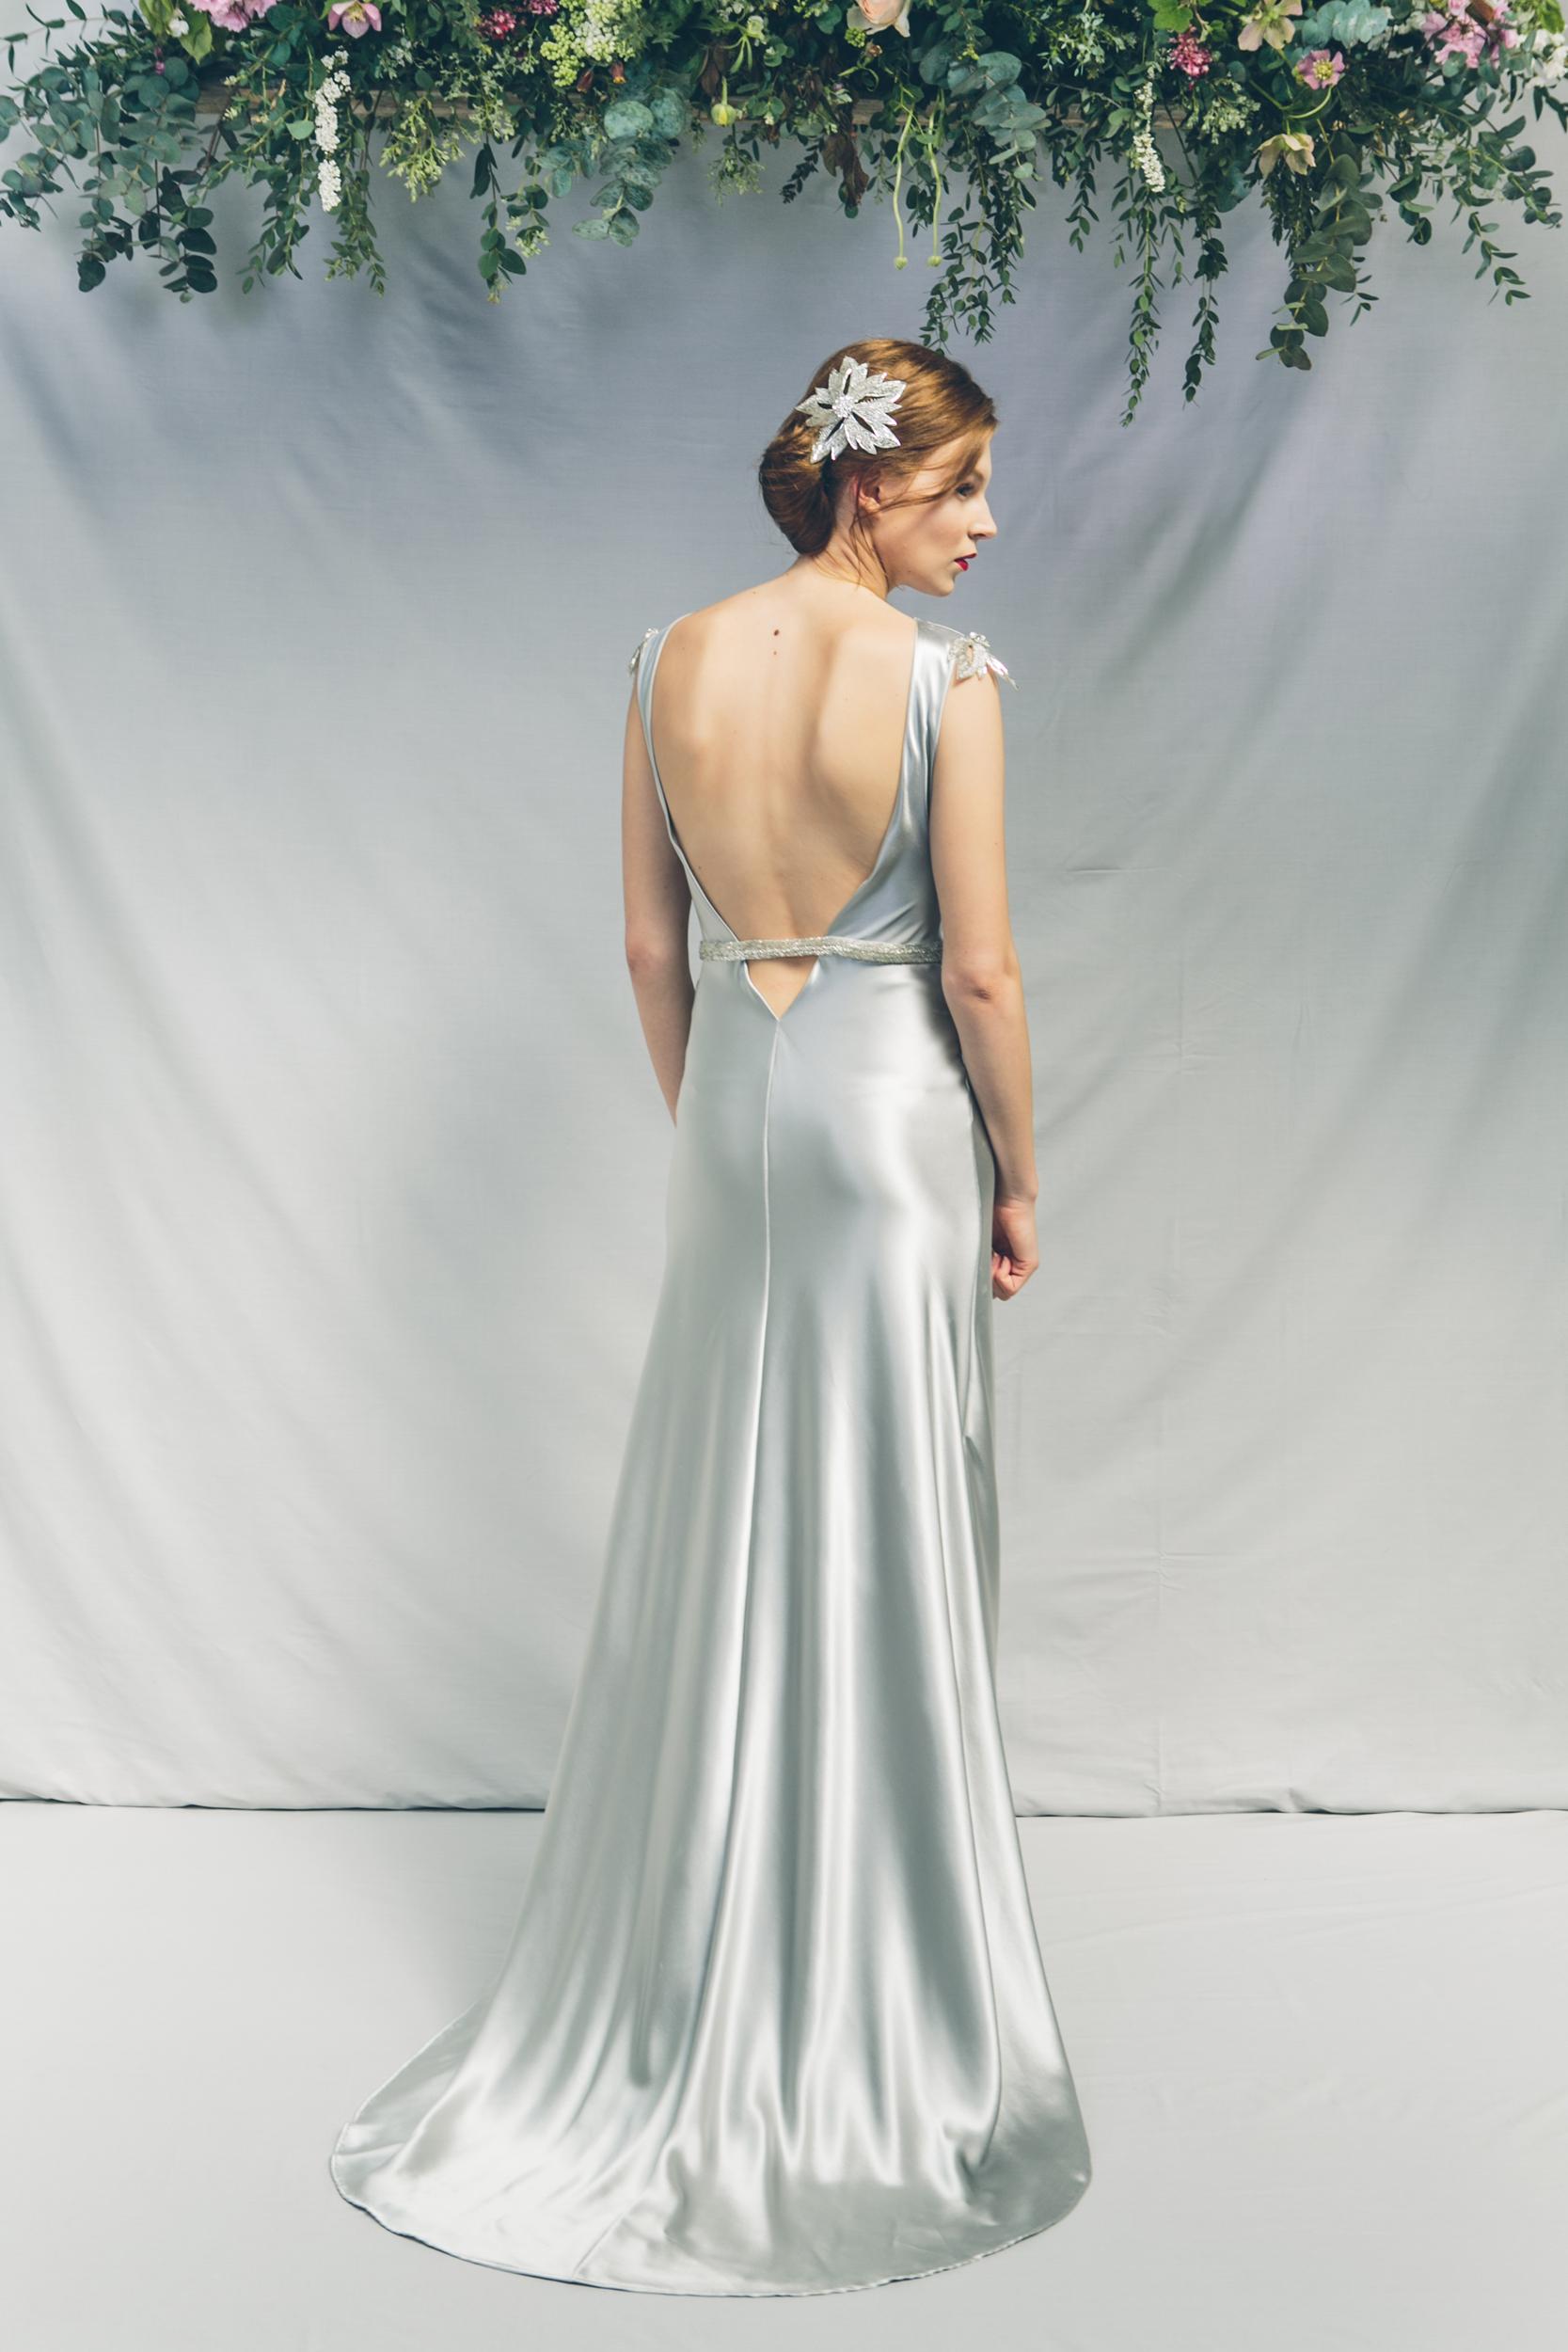 Kate-Beaumont-Wedding-Dresses-Sheffield-28.jpg